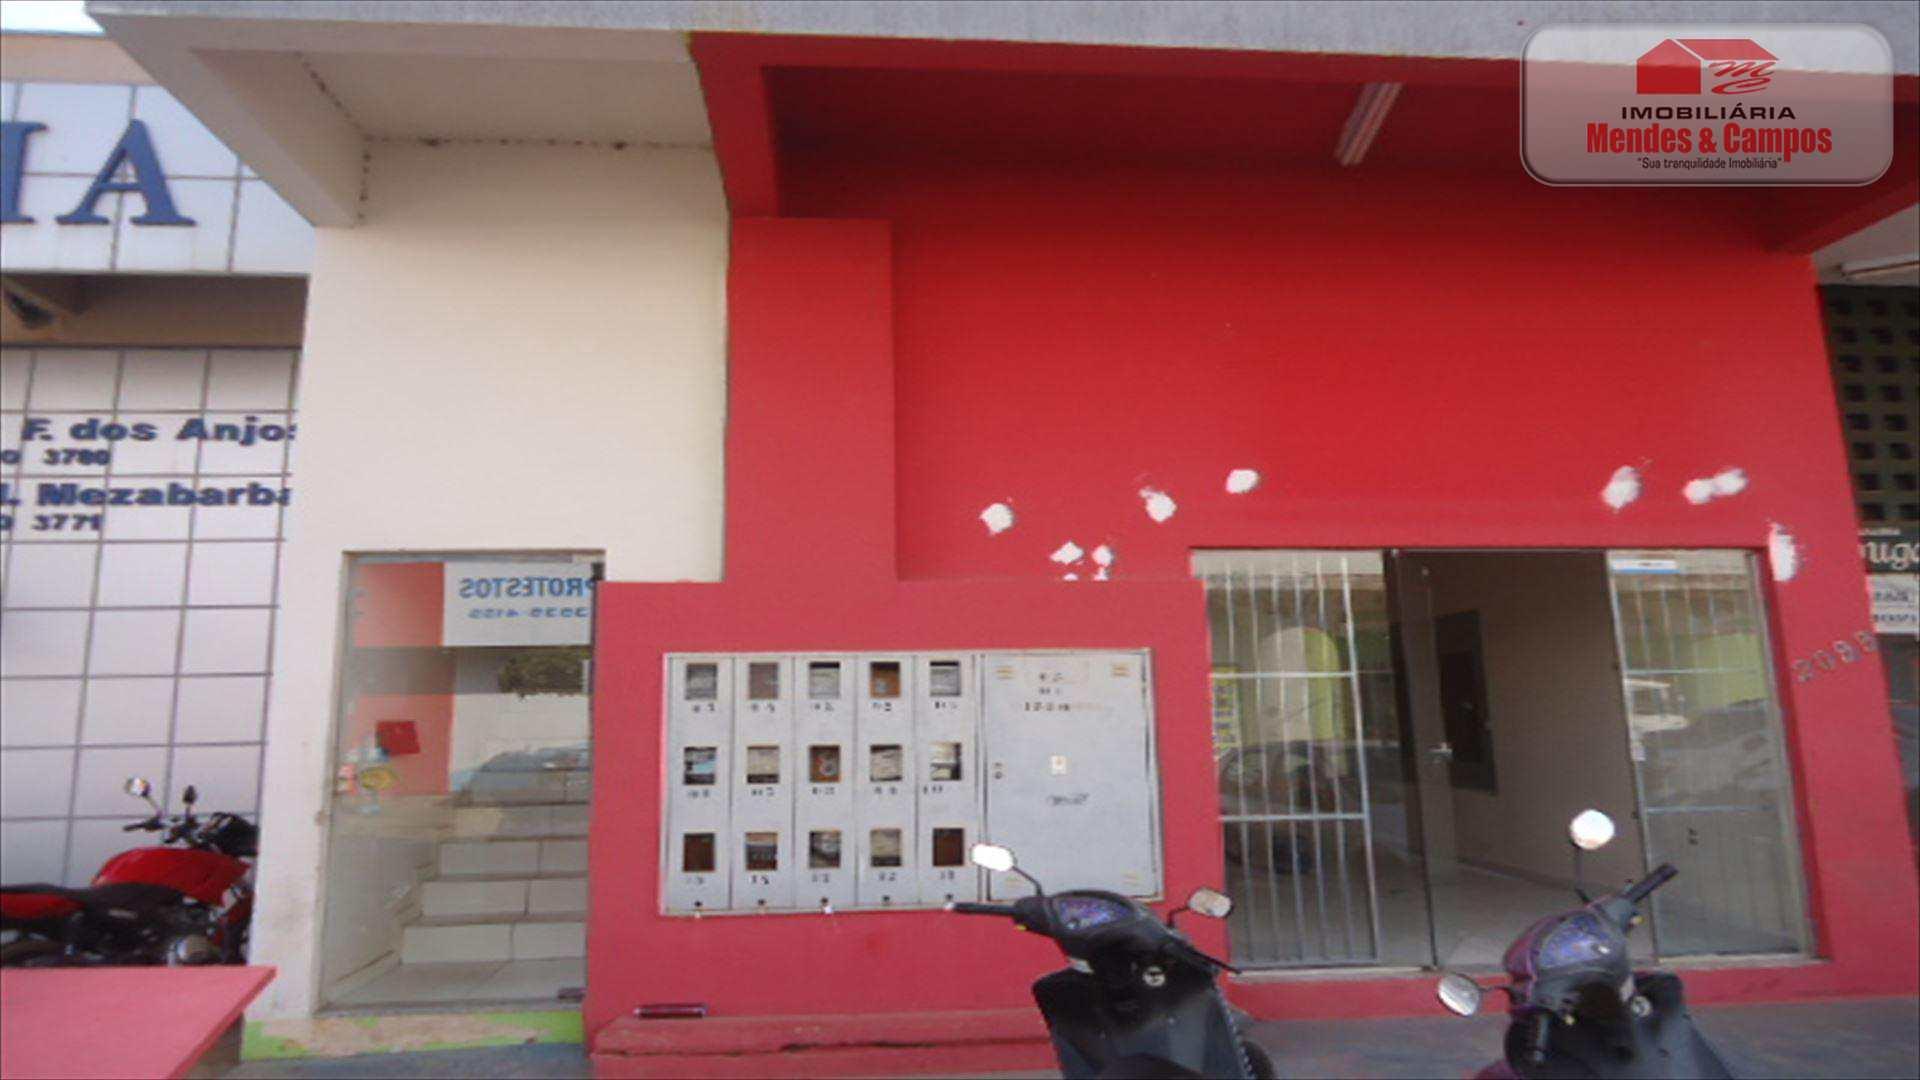 Rua Fortaleza nº 2099 Aptº 01 Setor 03, Cod:717